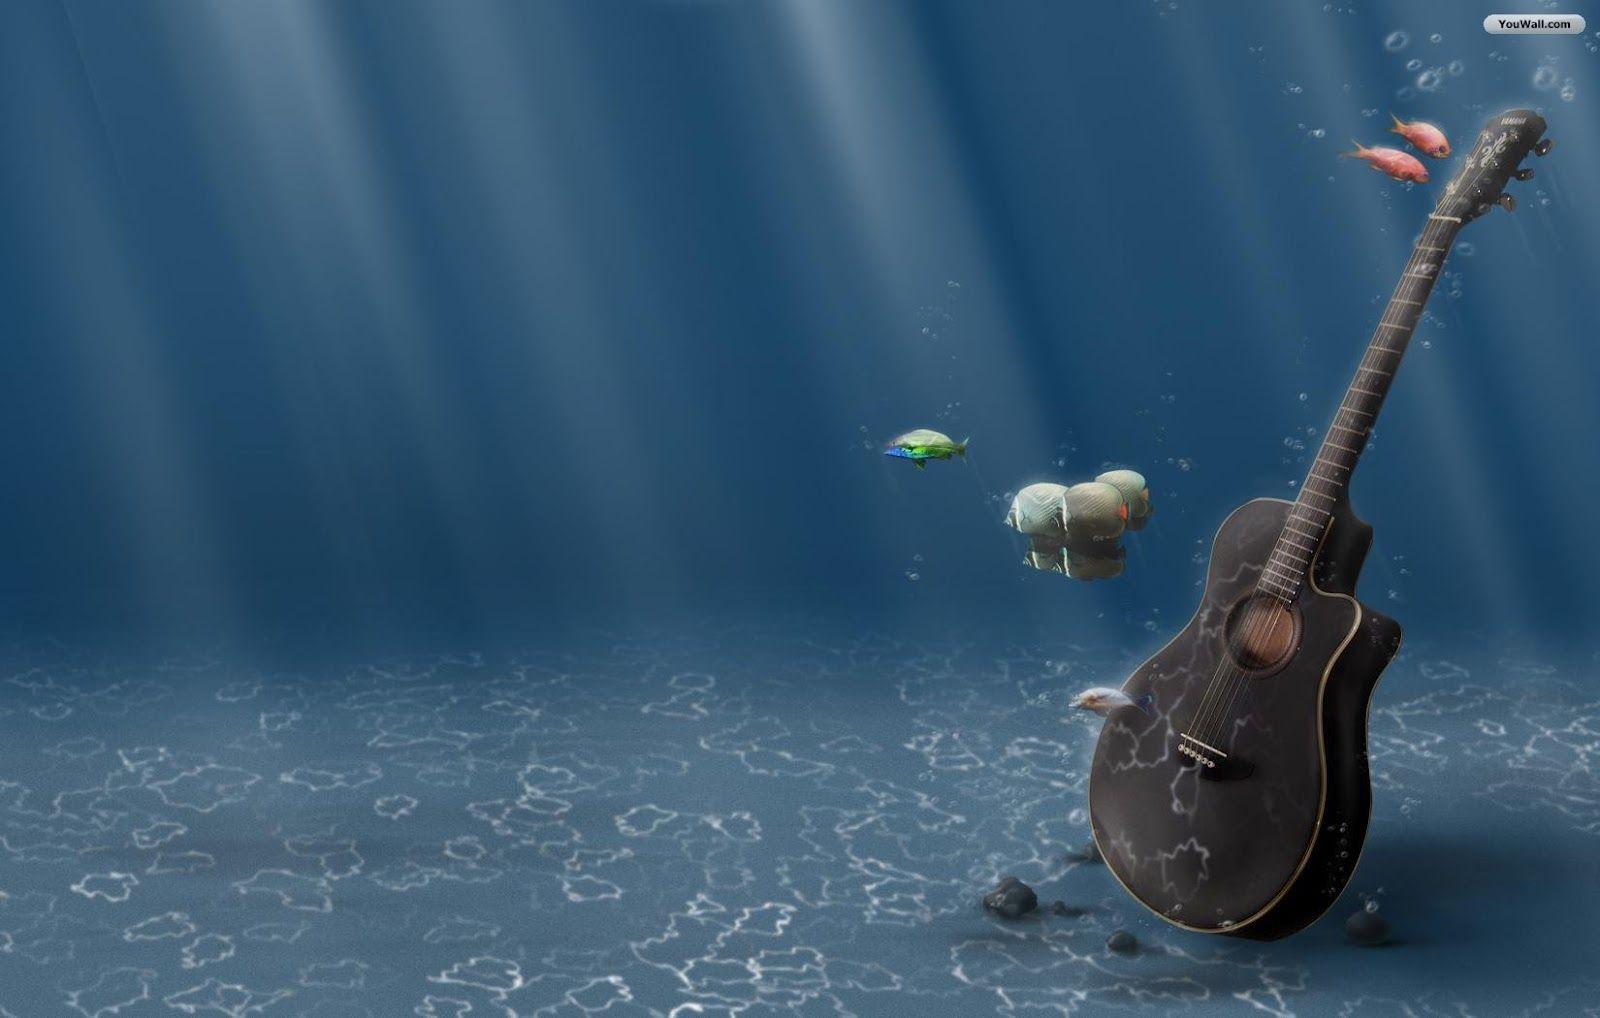 Download 200 Wallpaper Animasi Kupu-kupu Bergerak